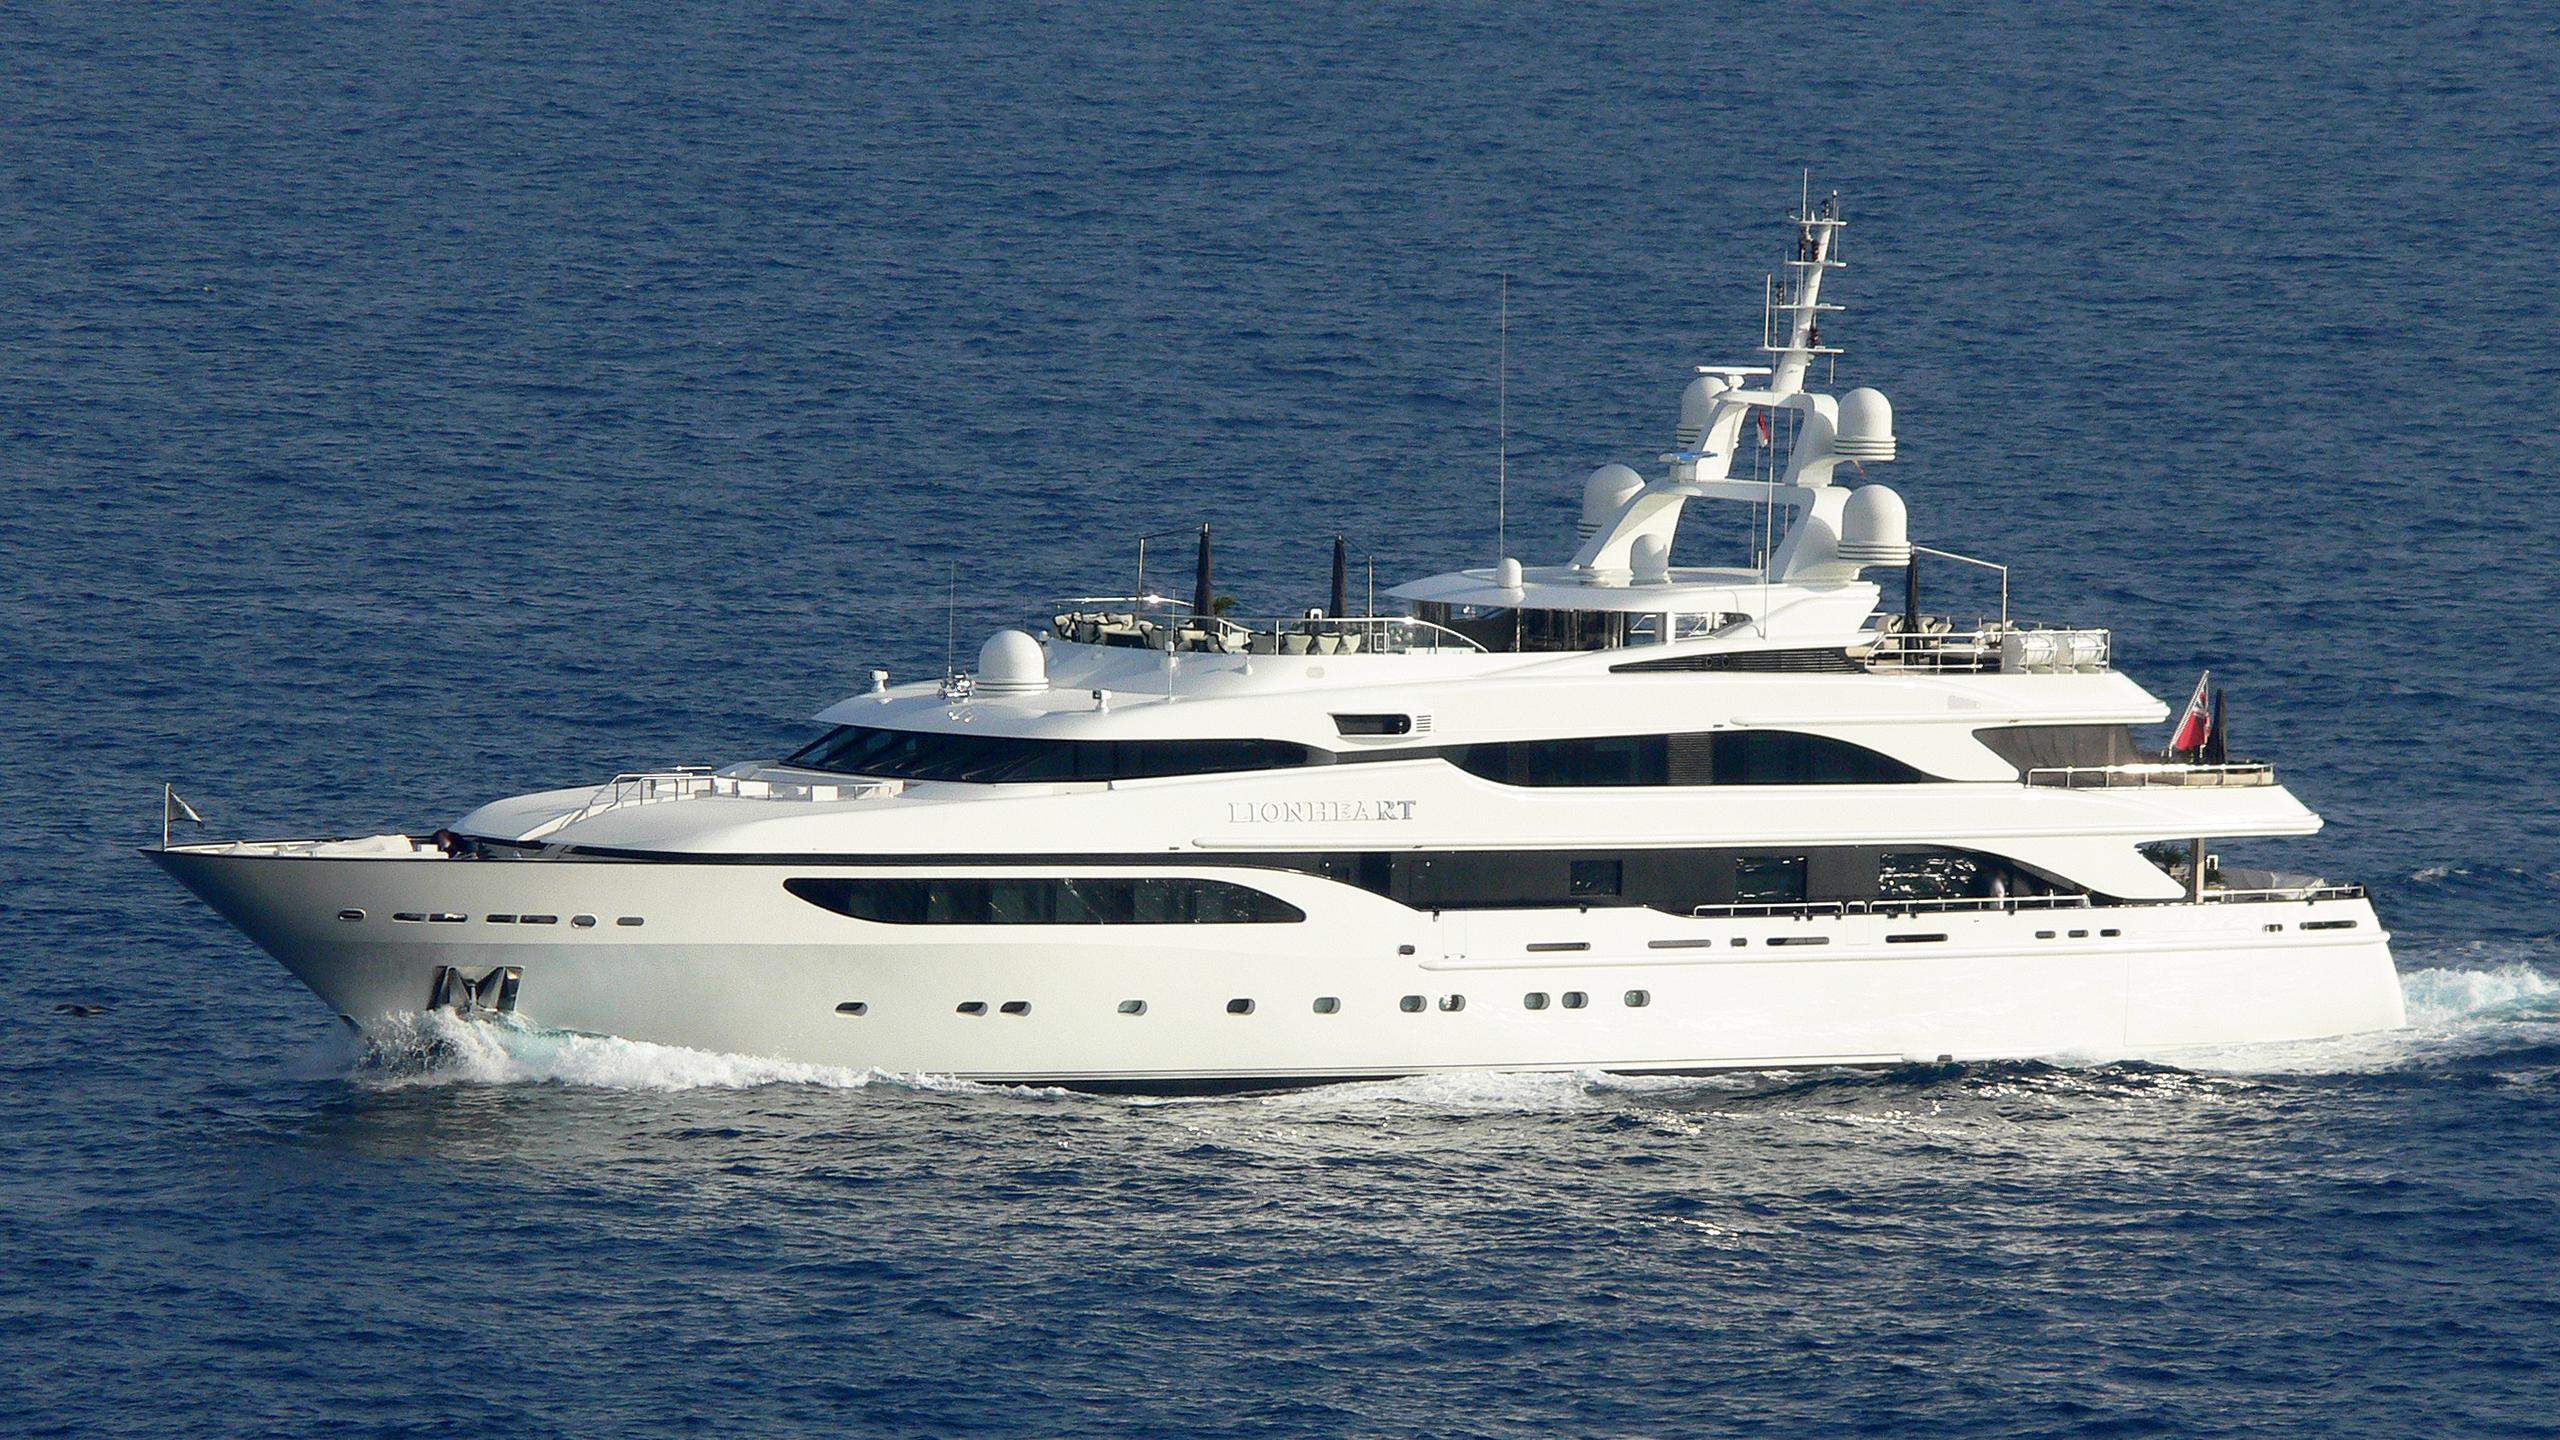 lioness-v-motor-yacht-benetti-2006-63m-profile